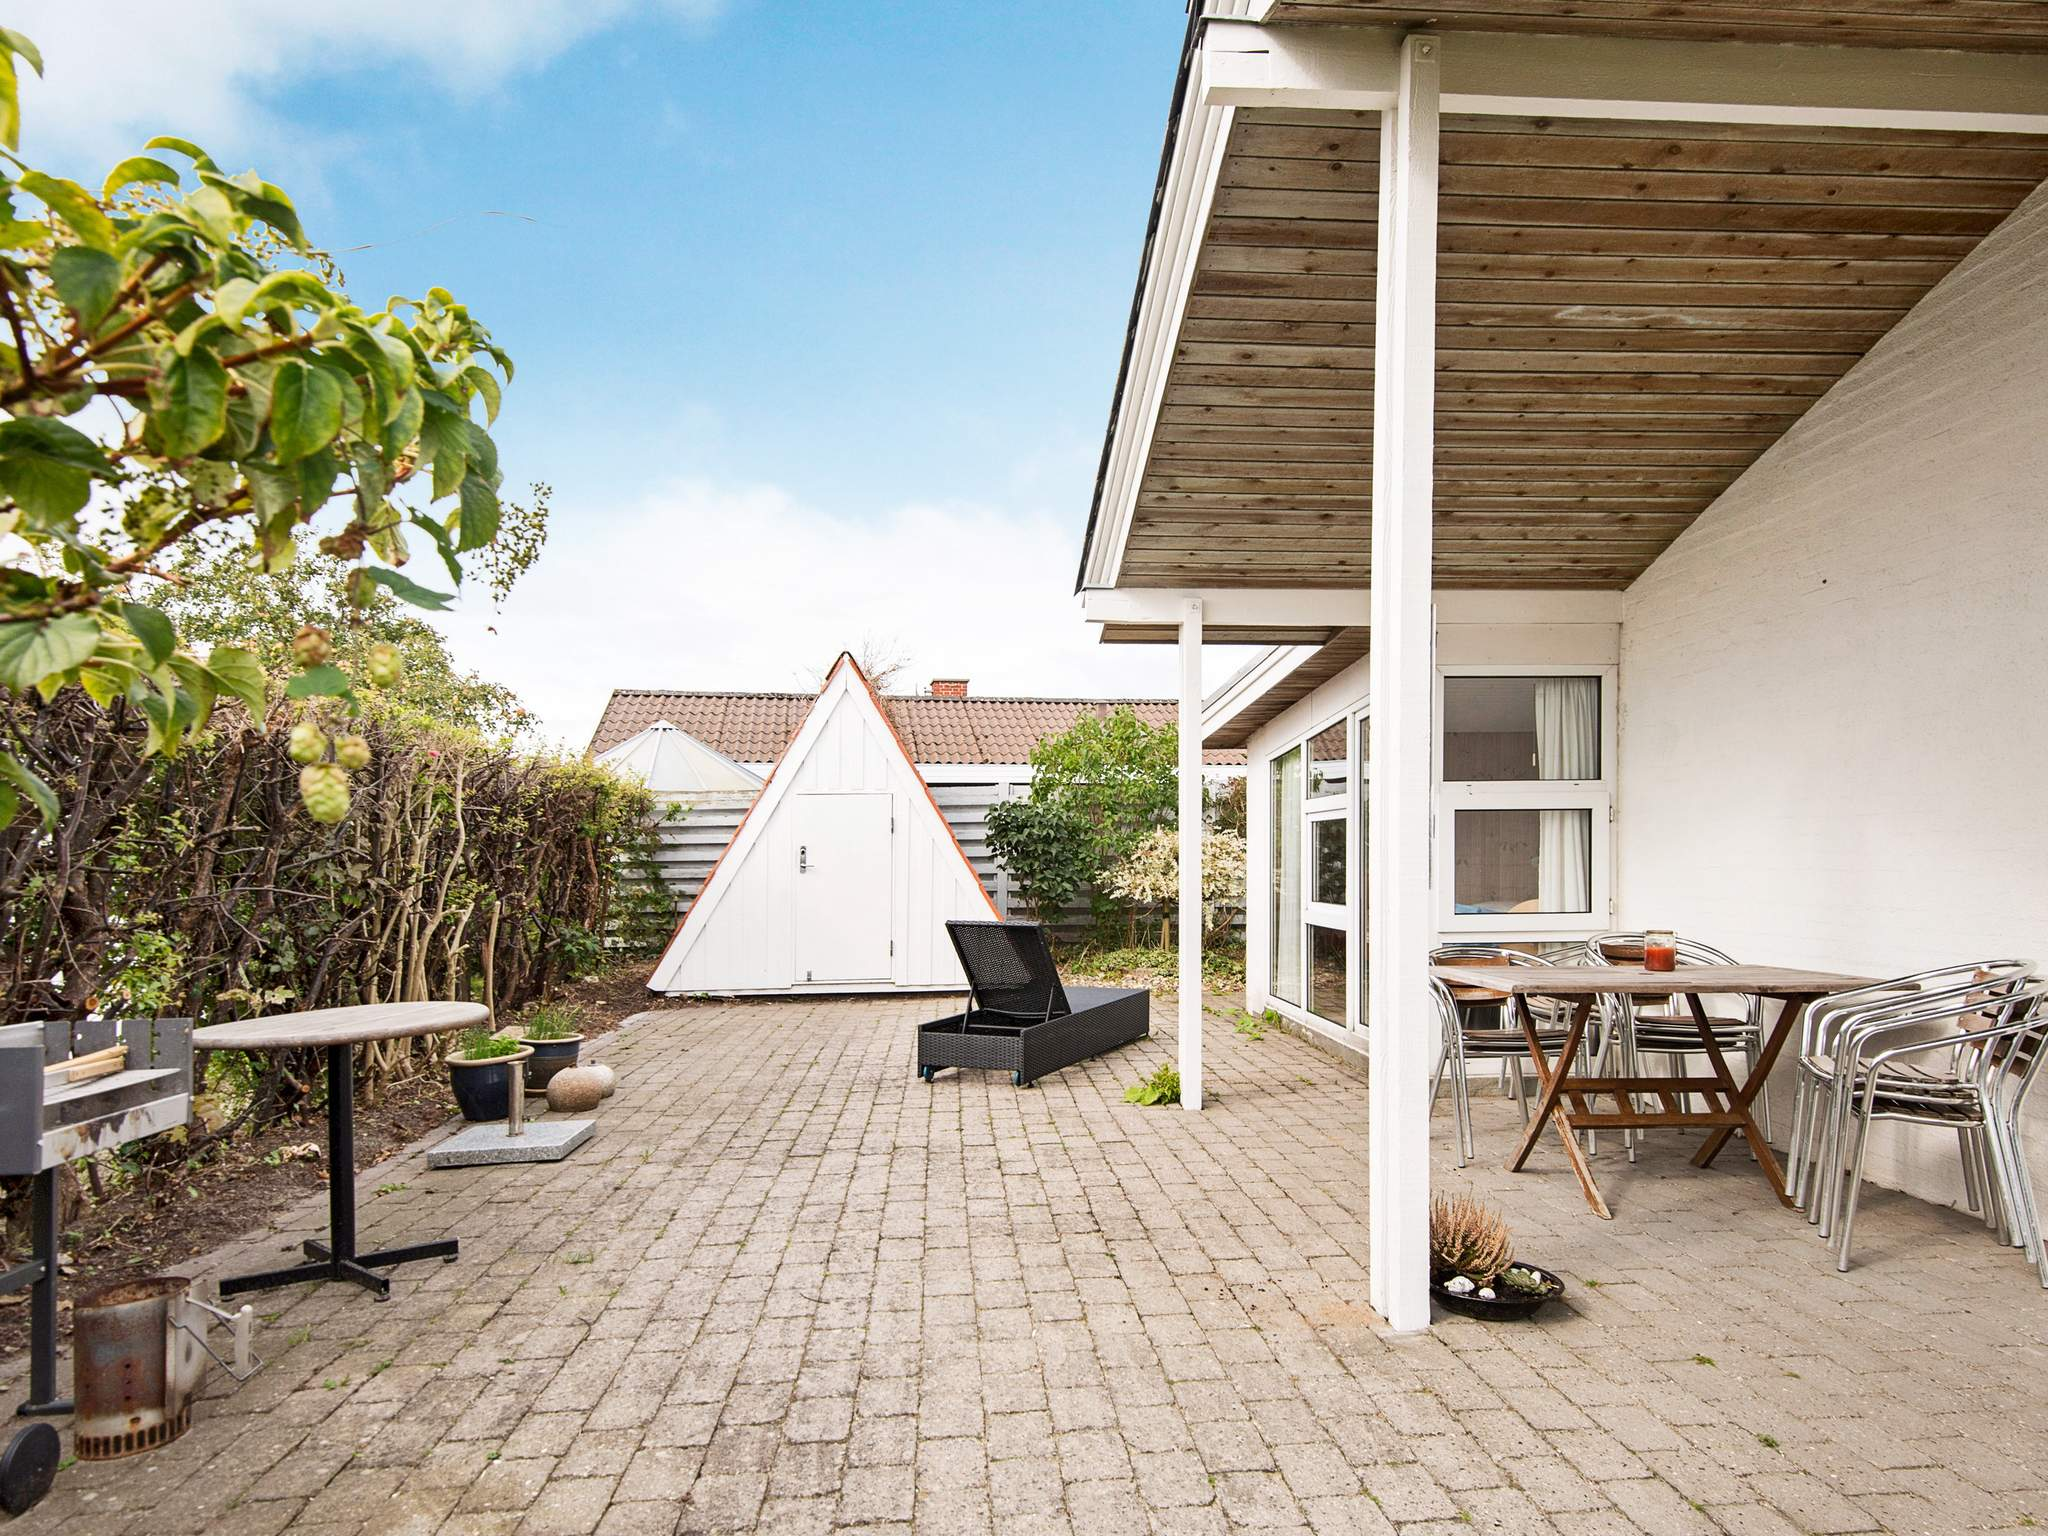 Ferienhaus Ajstrup Strand/Malling (2355032), Ajstrup, , Dänische Ostsee, Dänemark, Bild 17